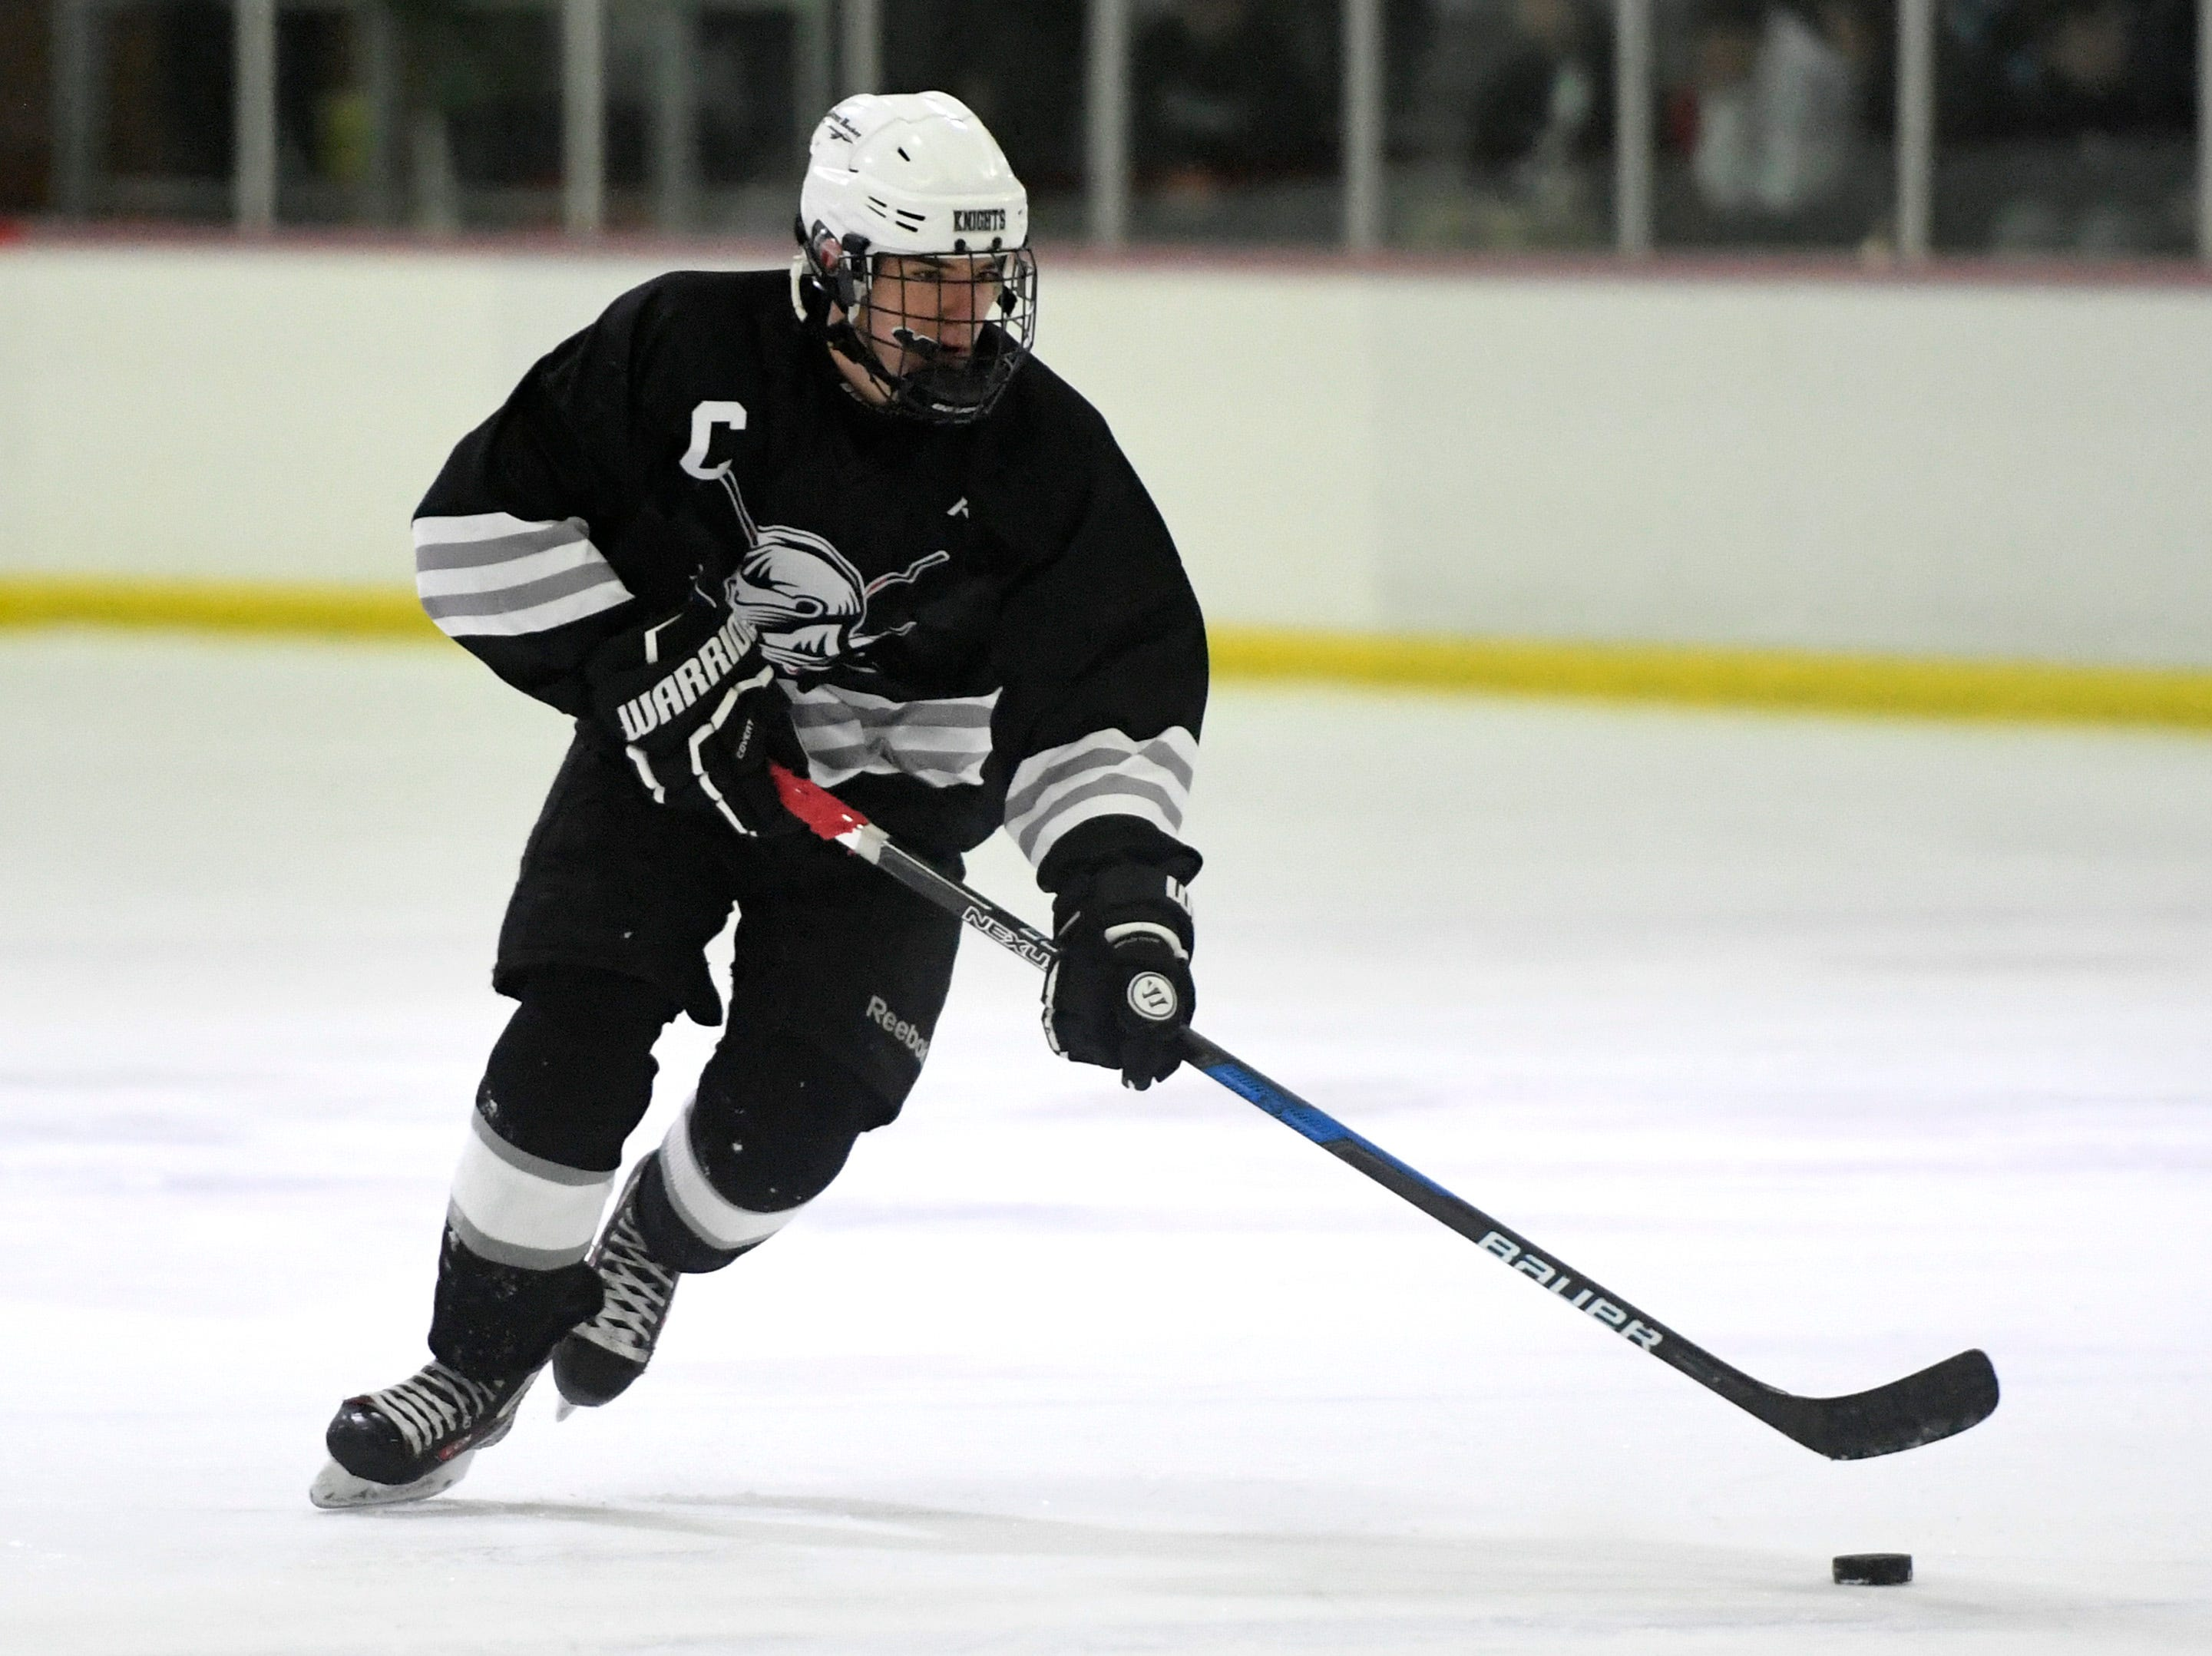 Wayne's Eric Kruglyak plays against Lakeland. Lakeland defeats Wayne in the Passaic County hockey championship, 6-3, on Monday, Jan. 28, 2019 in Little Falls.